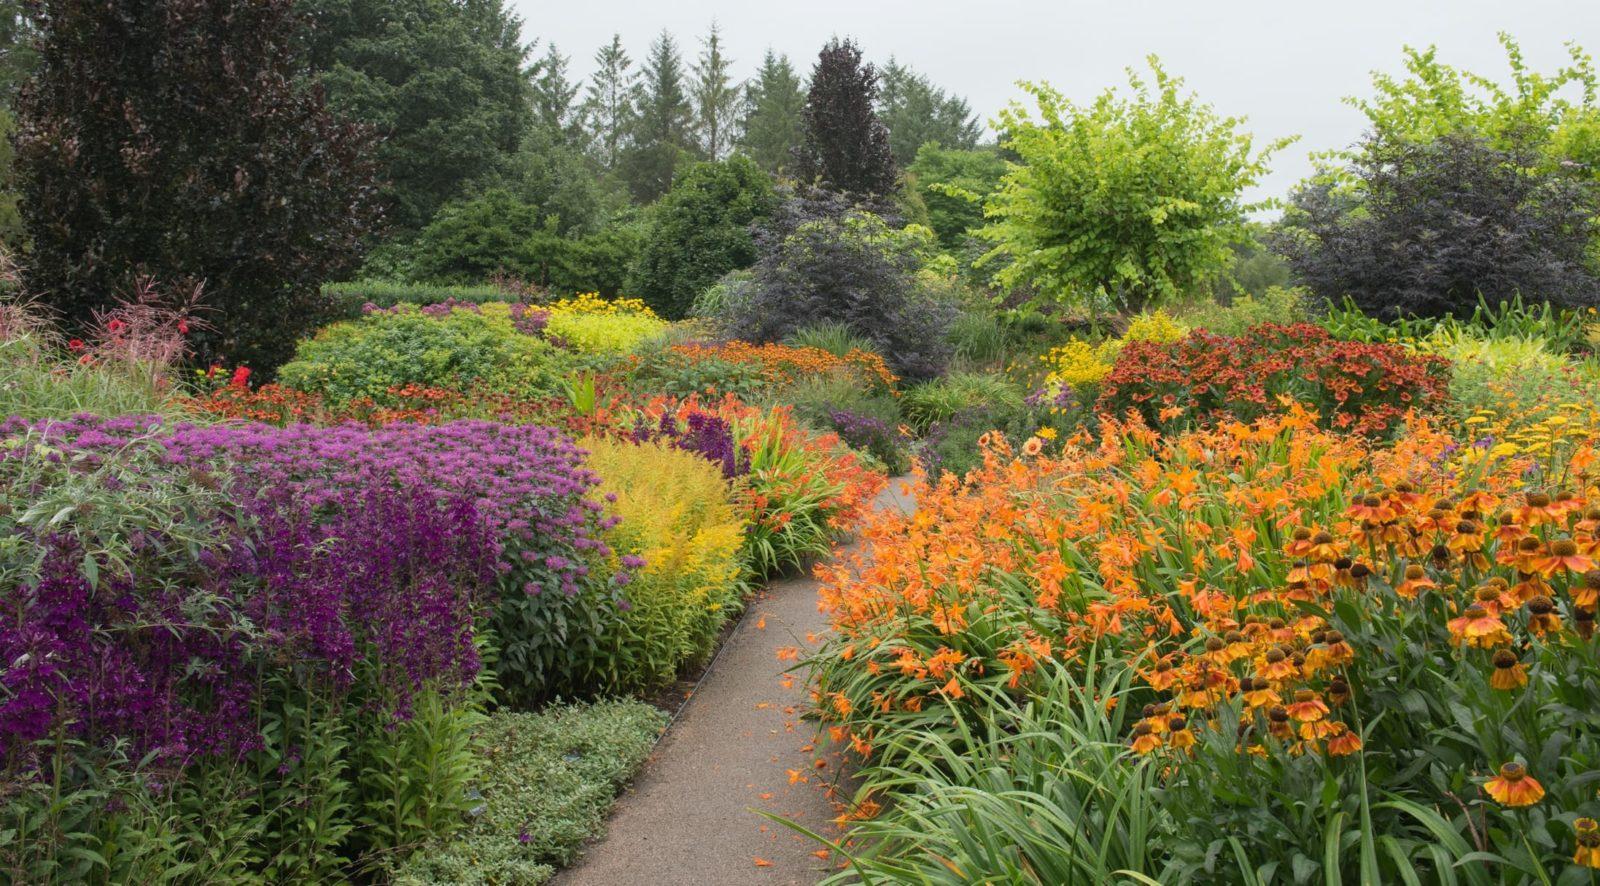 a path leading alongside a colourful herbaceous border with Crocosmia, Monarda and Coneflowers